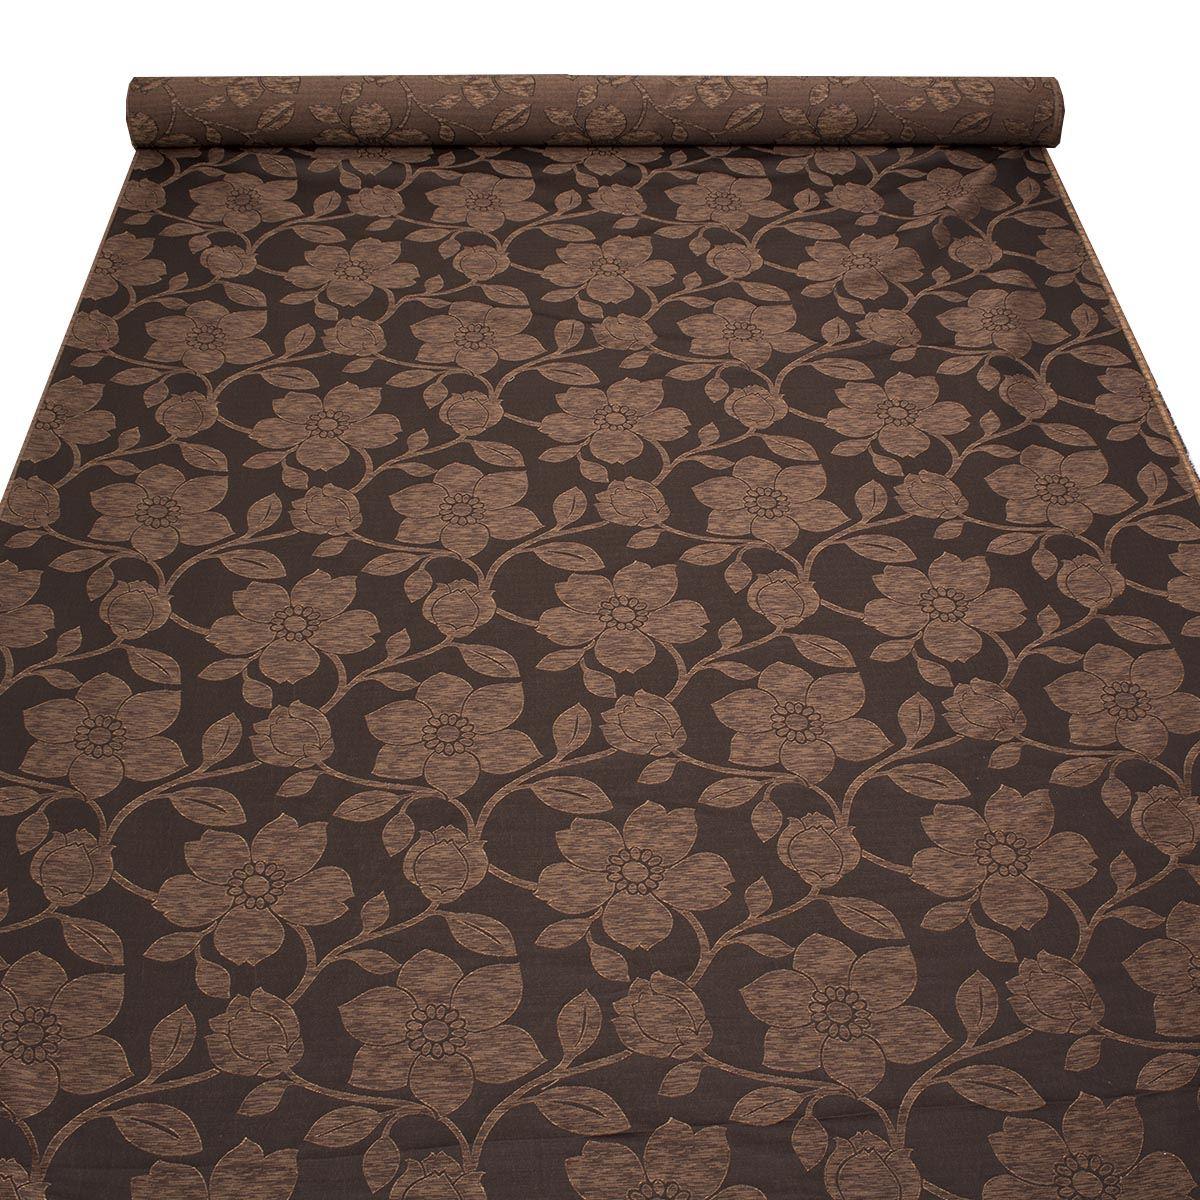 cadiz jacquard stoff gewebt blumenmuster weiche seide filz vorhang polster ebay. Black Bedroom Furniture Sets. Home Design Ideas